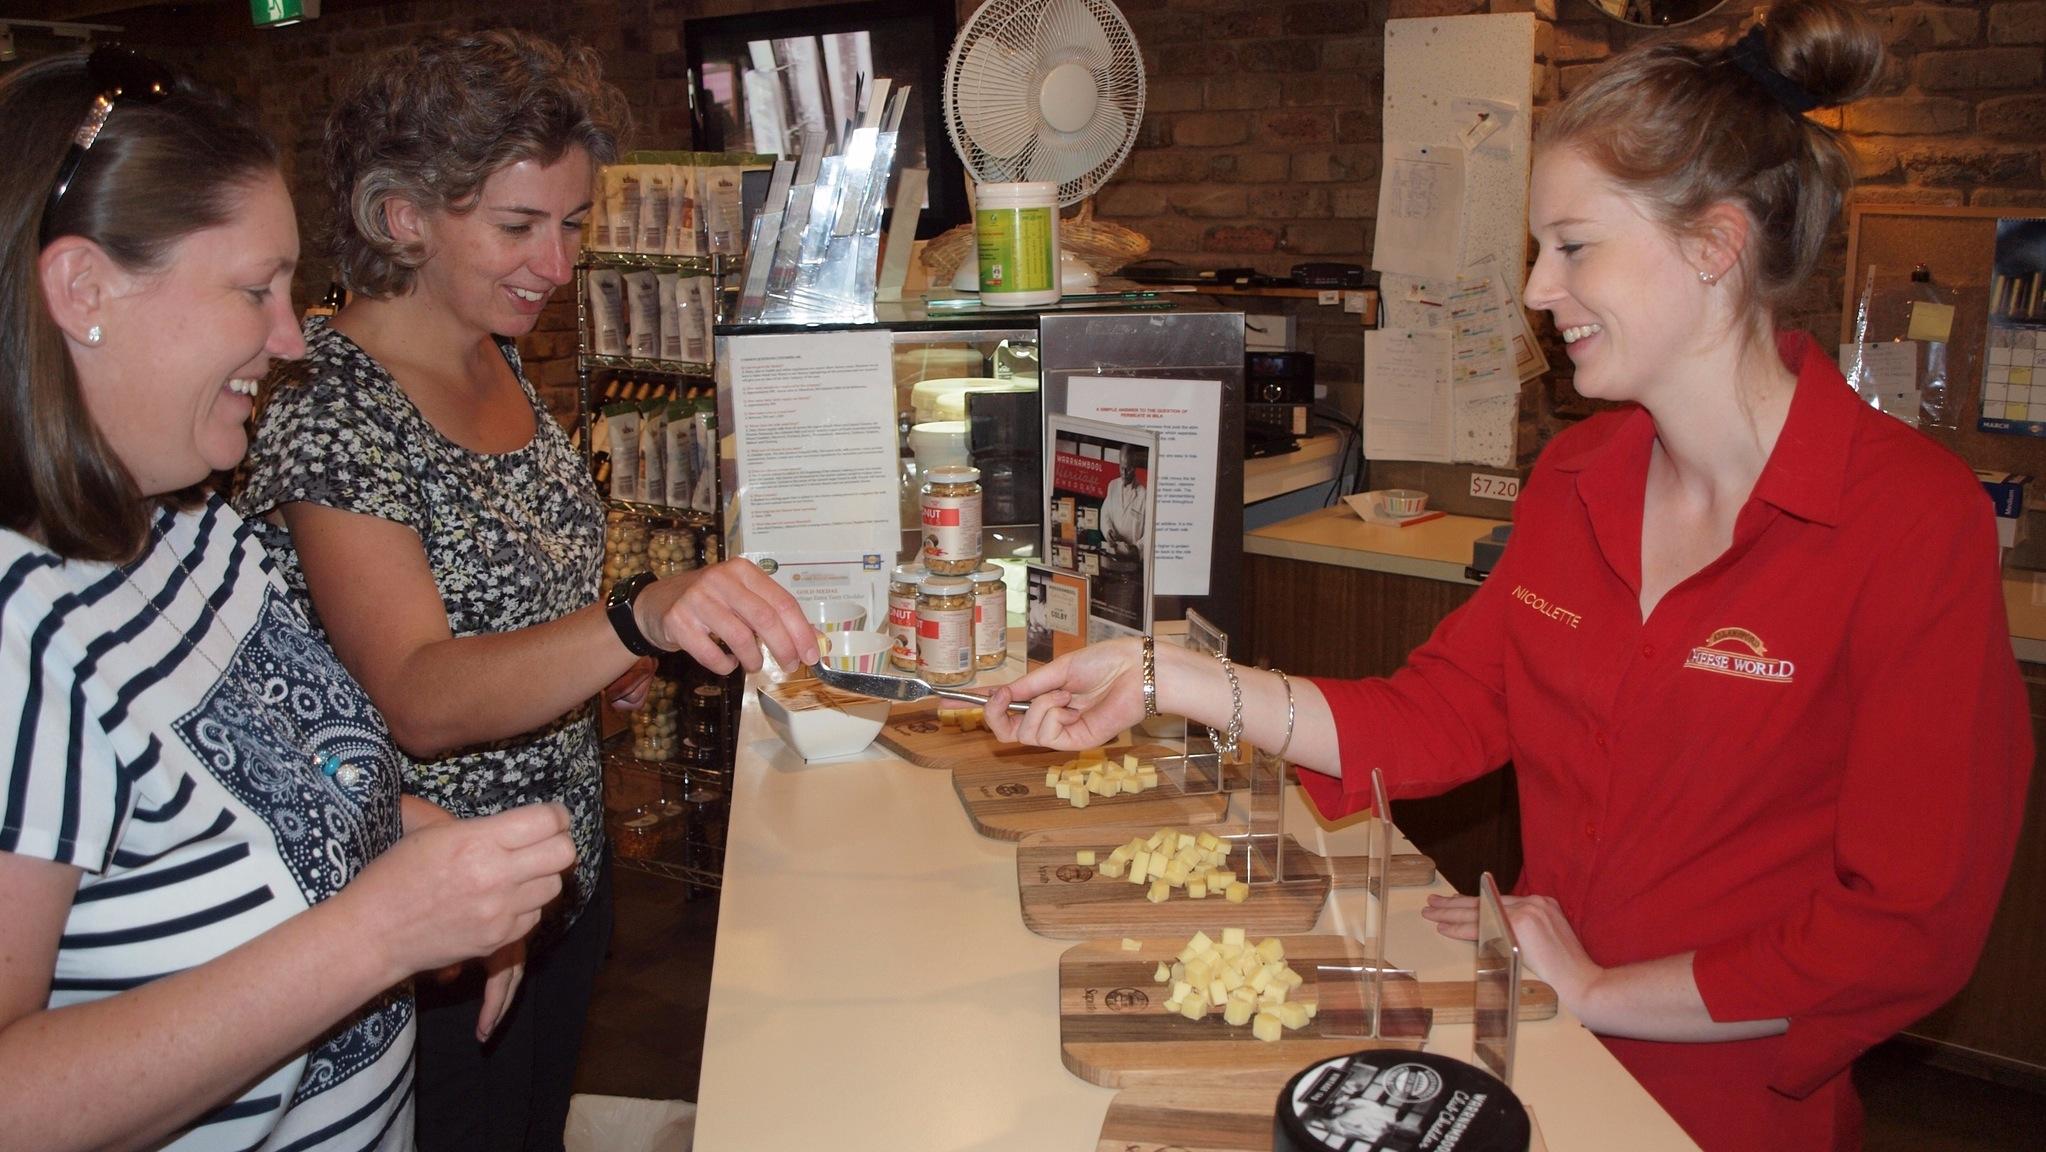 Sampling the award winning cheddars